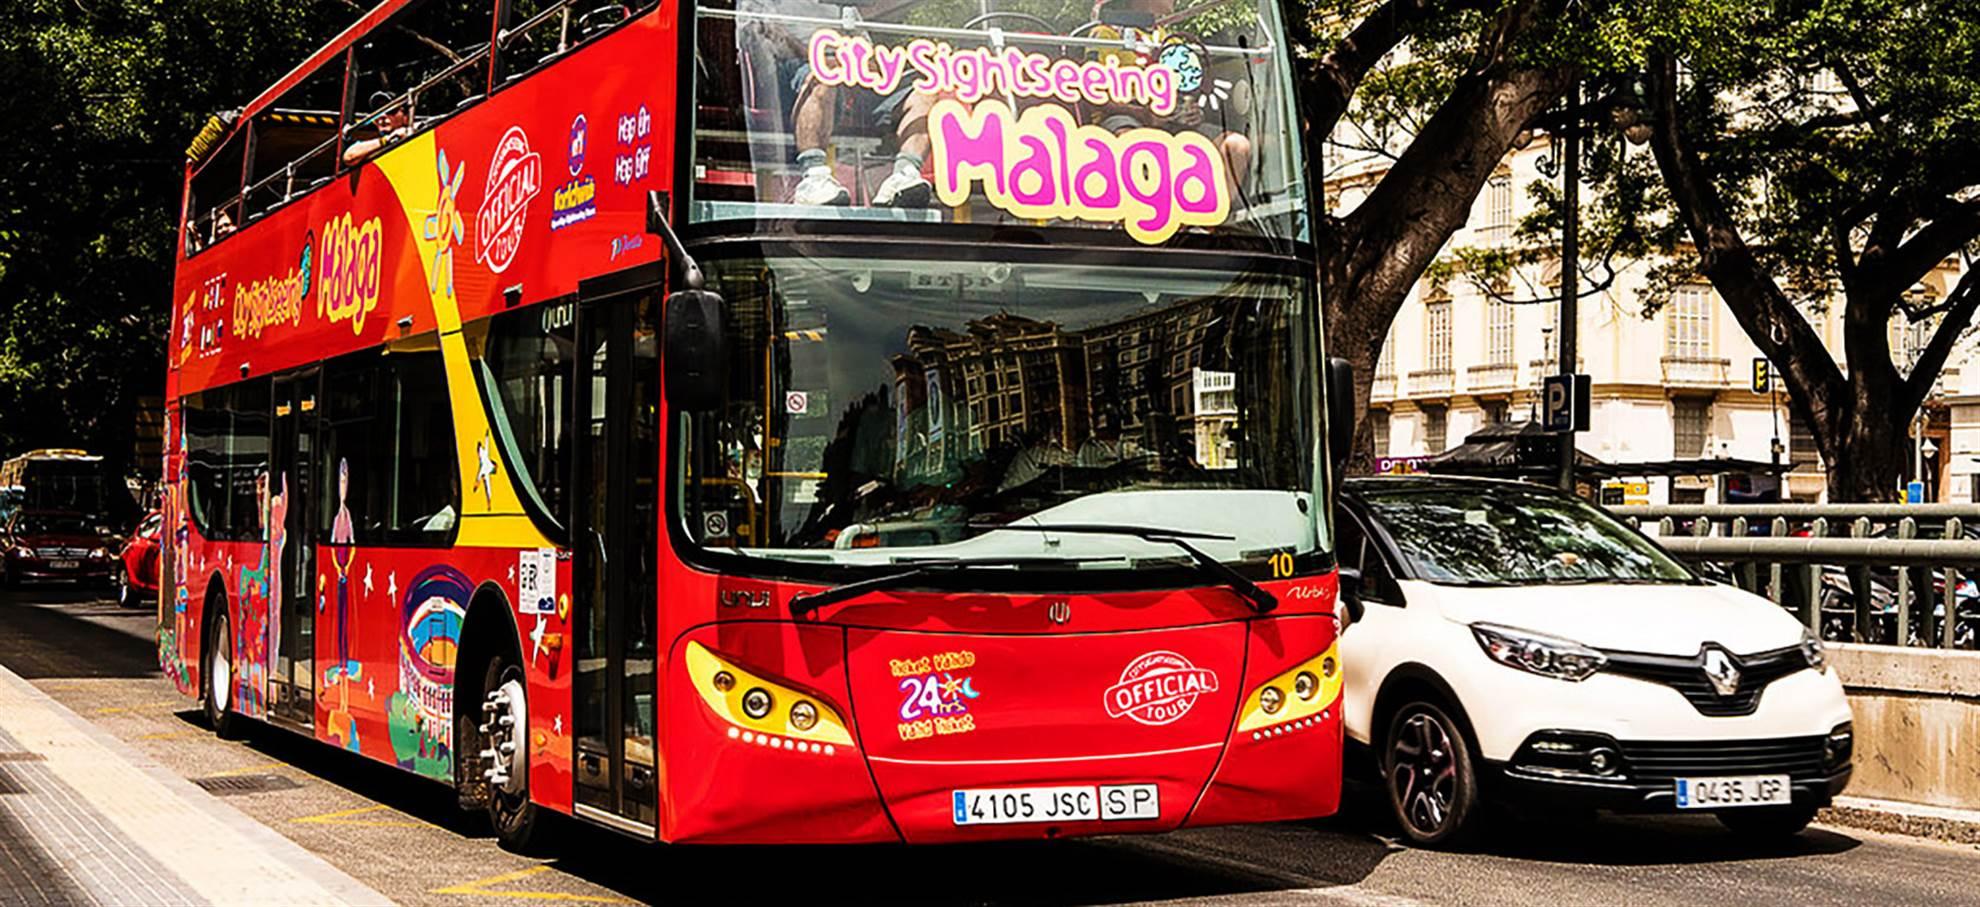 Malaga Hop on Hop off bus